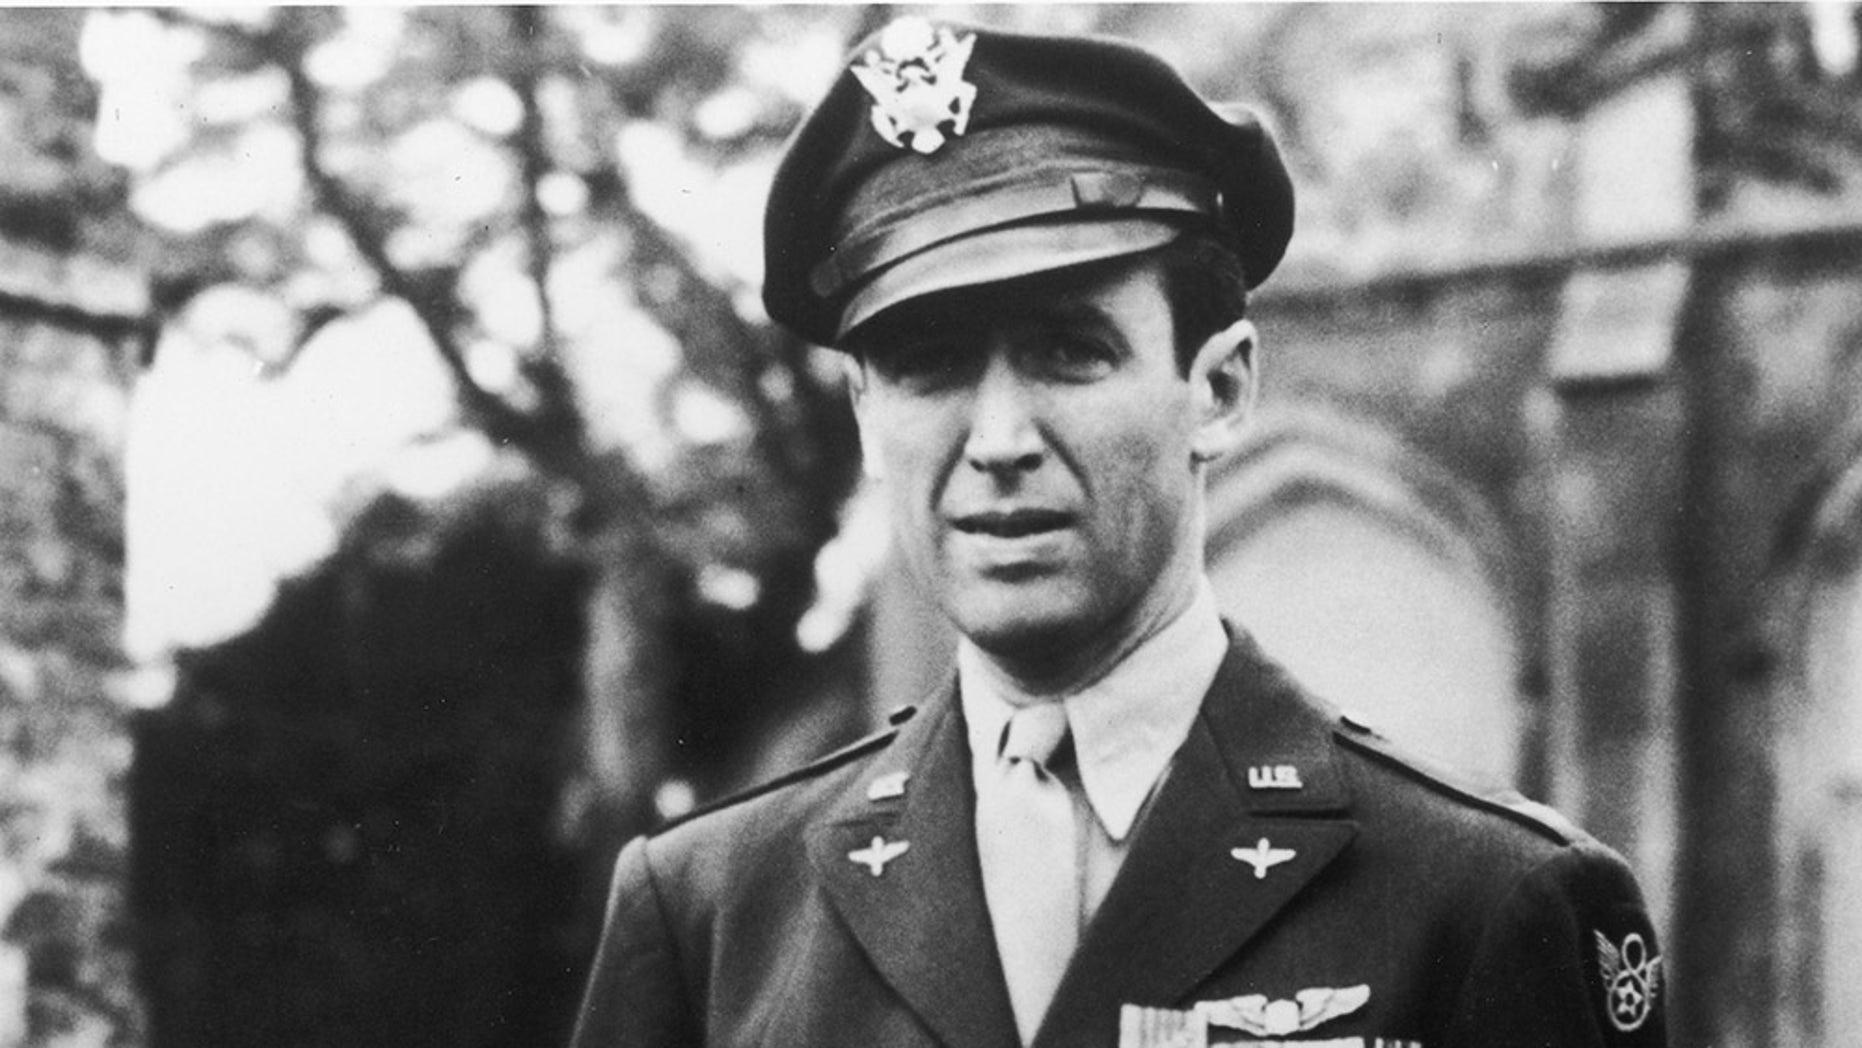 James Stewart in his U.S. Air Force Officer's uniform during World War II.